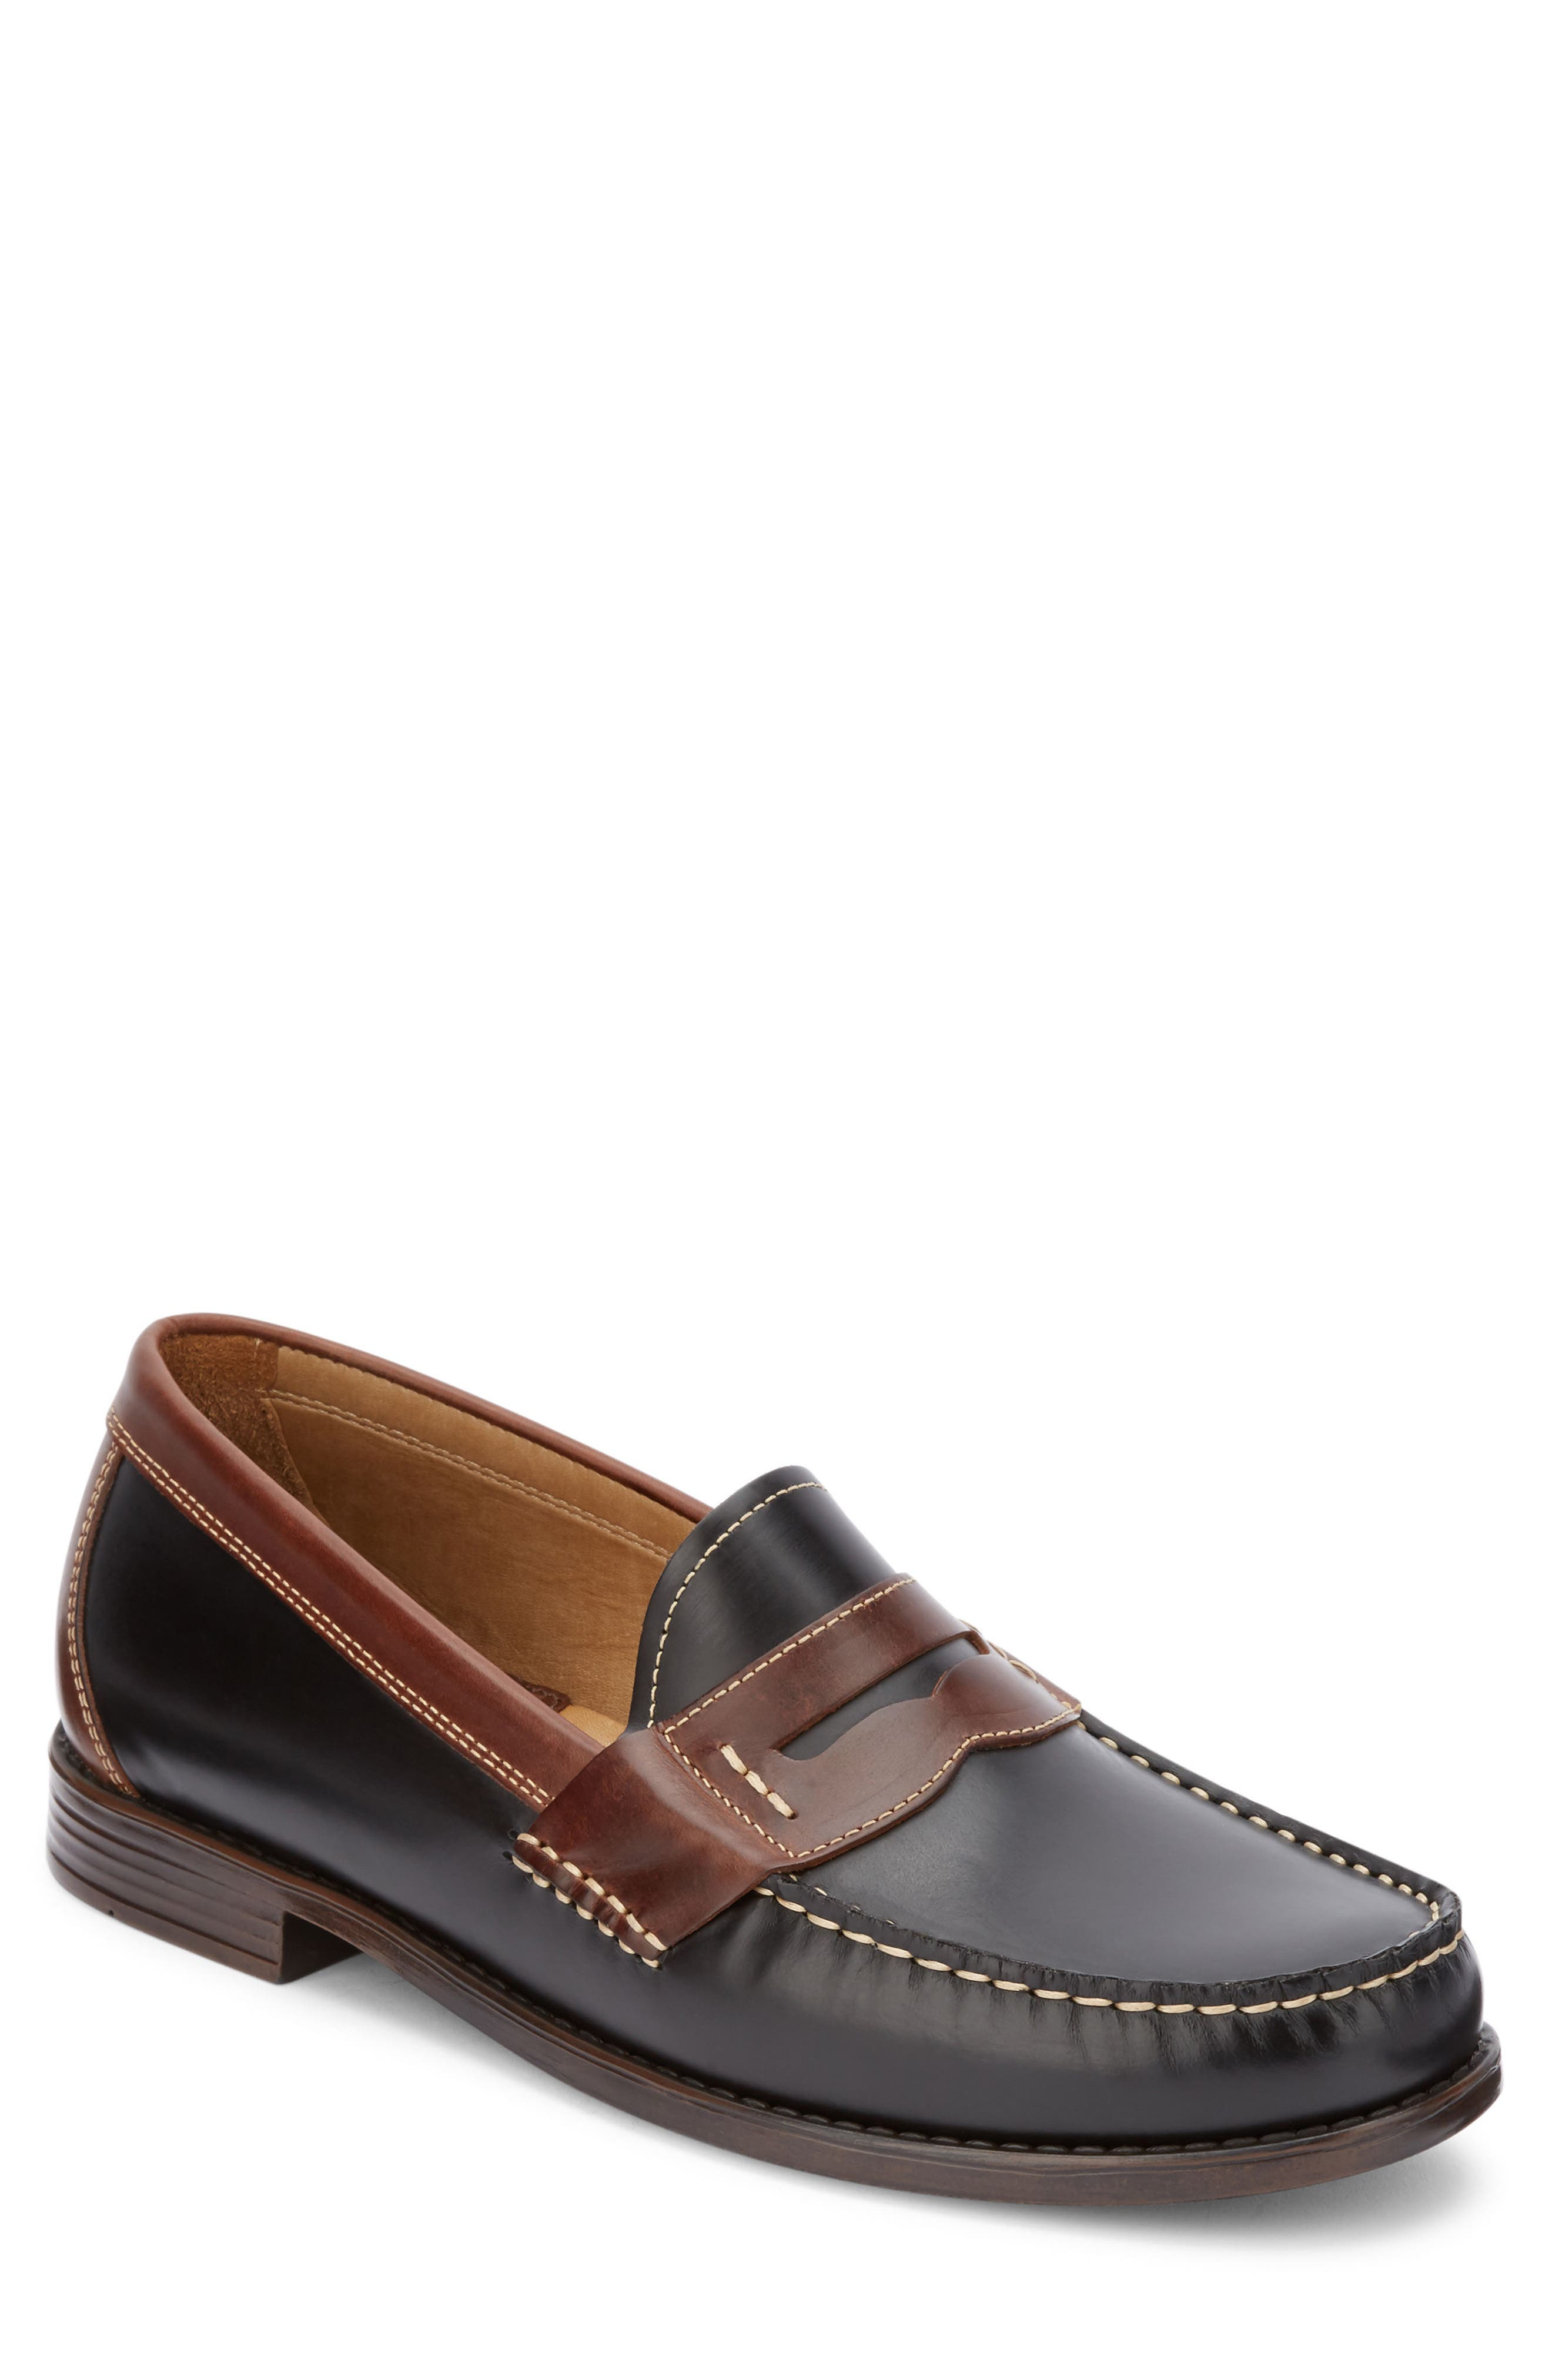 Wagner Penny Loafer,                         Main,                         color, Black/ Dark Brown Leather